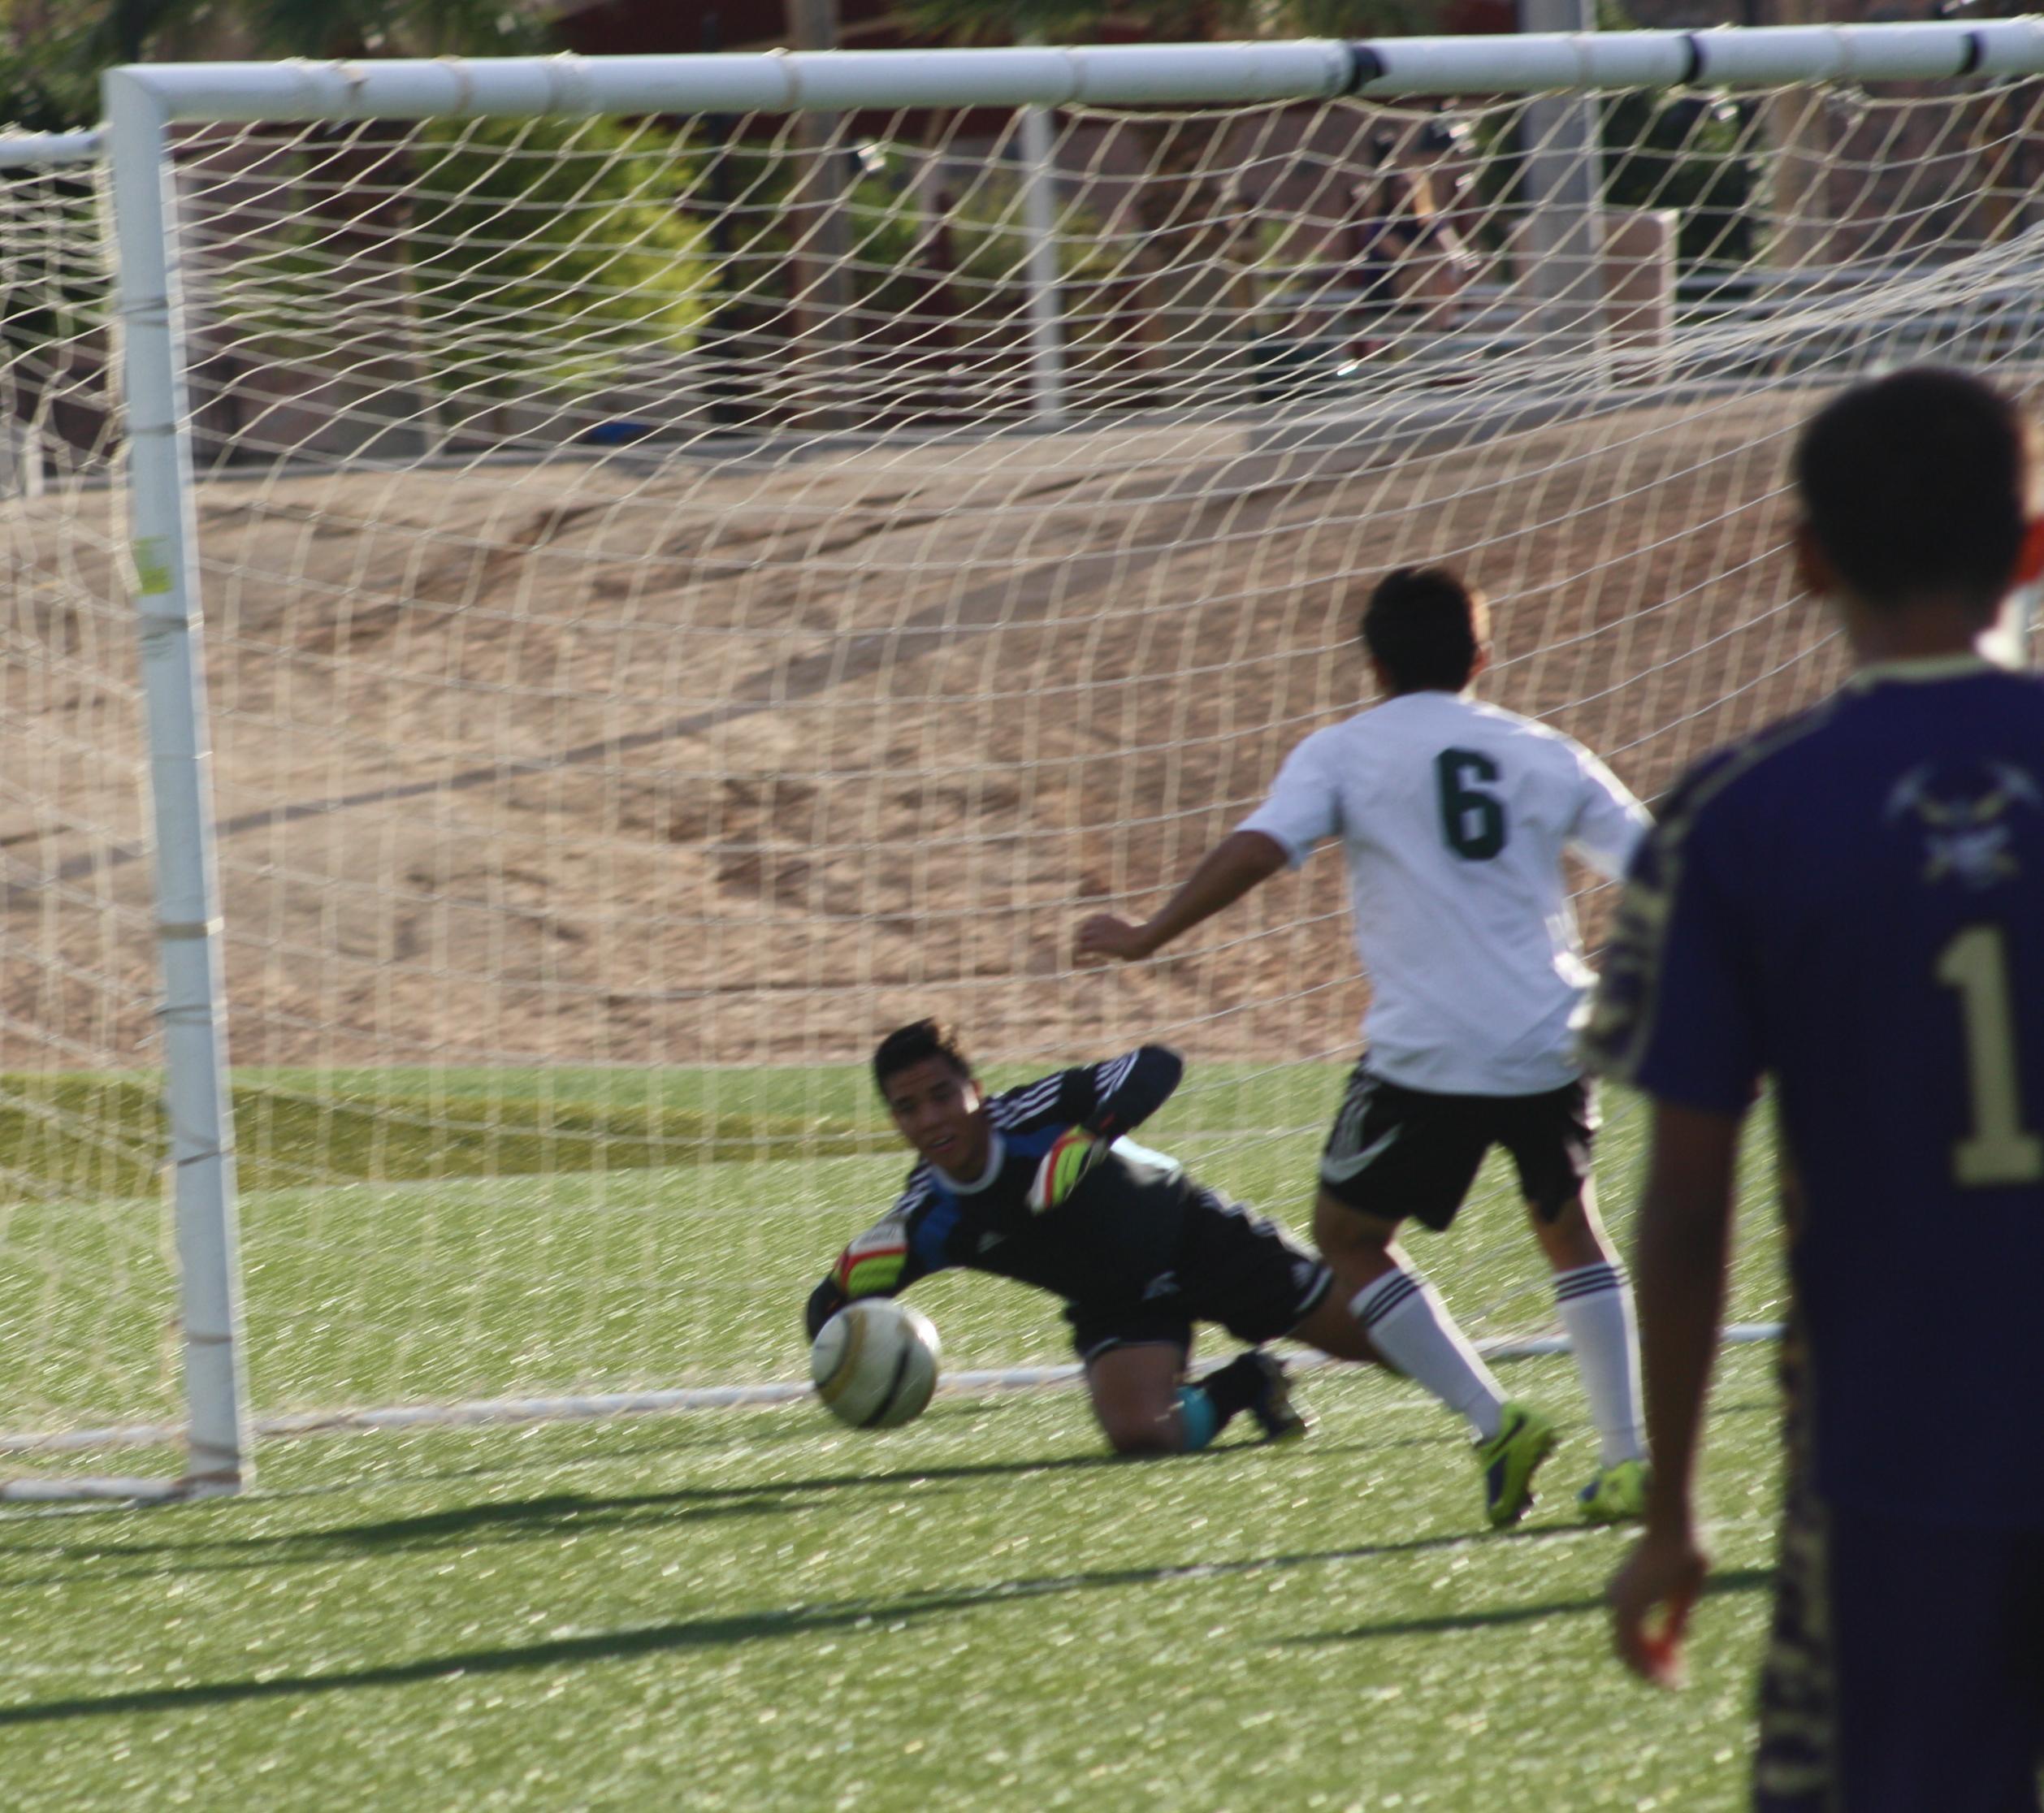 Miners shut out Bulldog soccer teams 4-0, 2-0